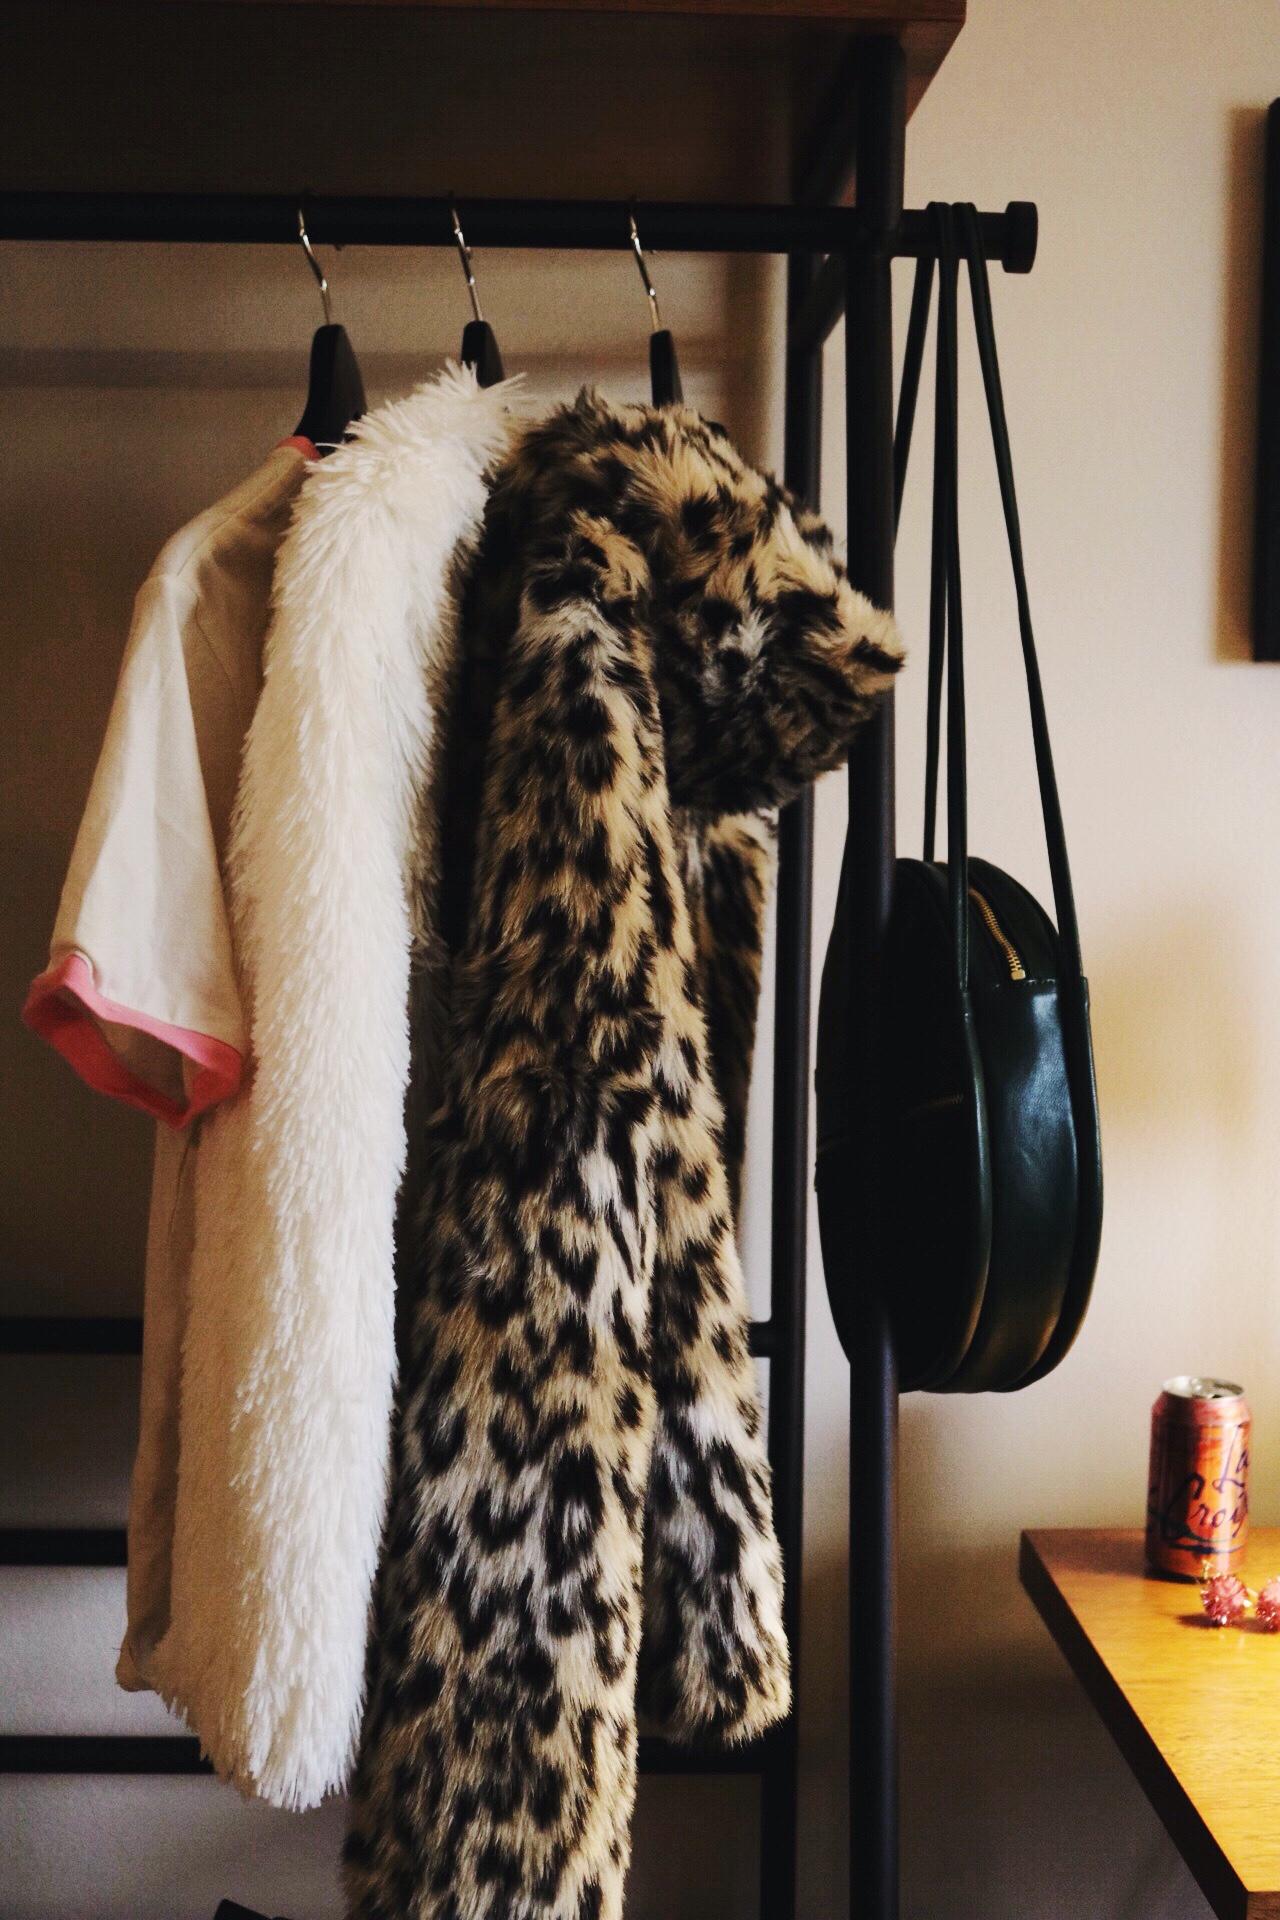 White fur jacket, cheetah jacket, ban.do bag, travel, san francisco hotel